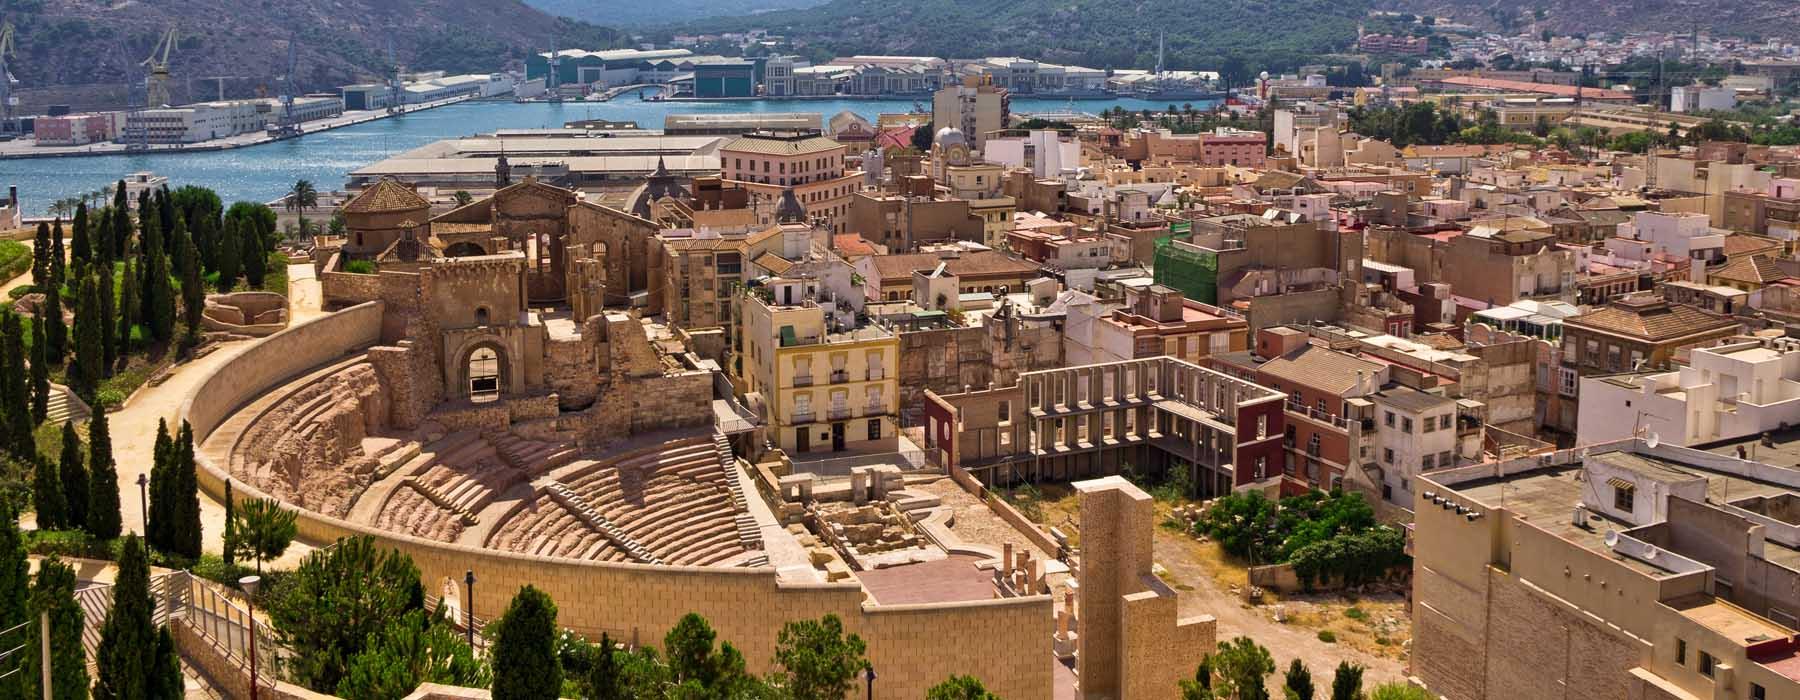 Museum + Roman Theater + Roman Forum thermal springs + Castle of Concepción